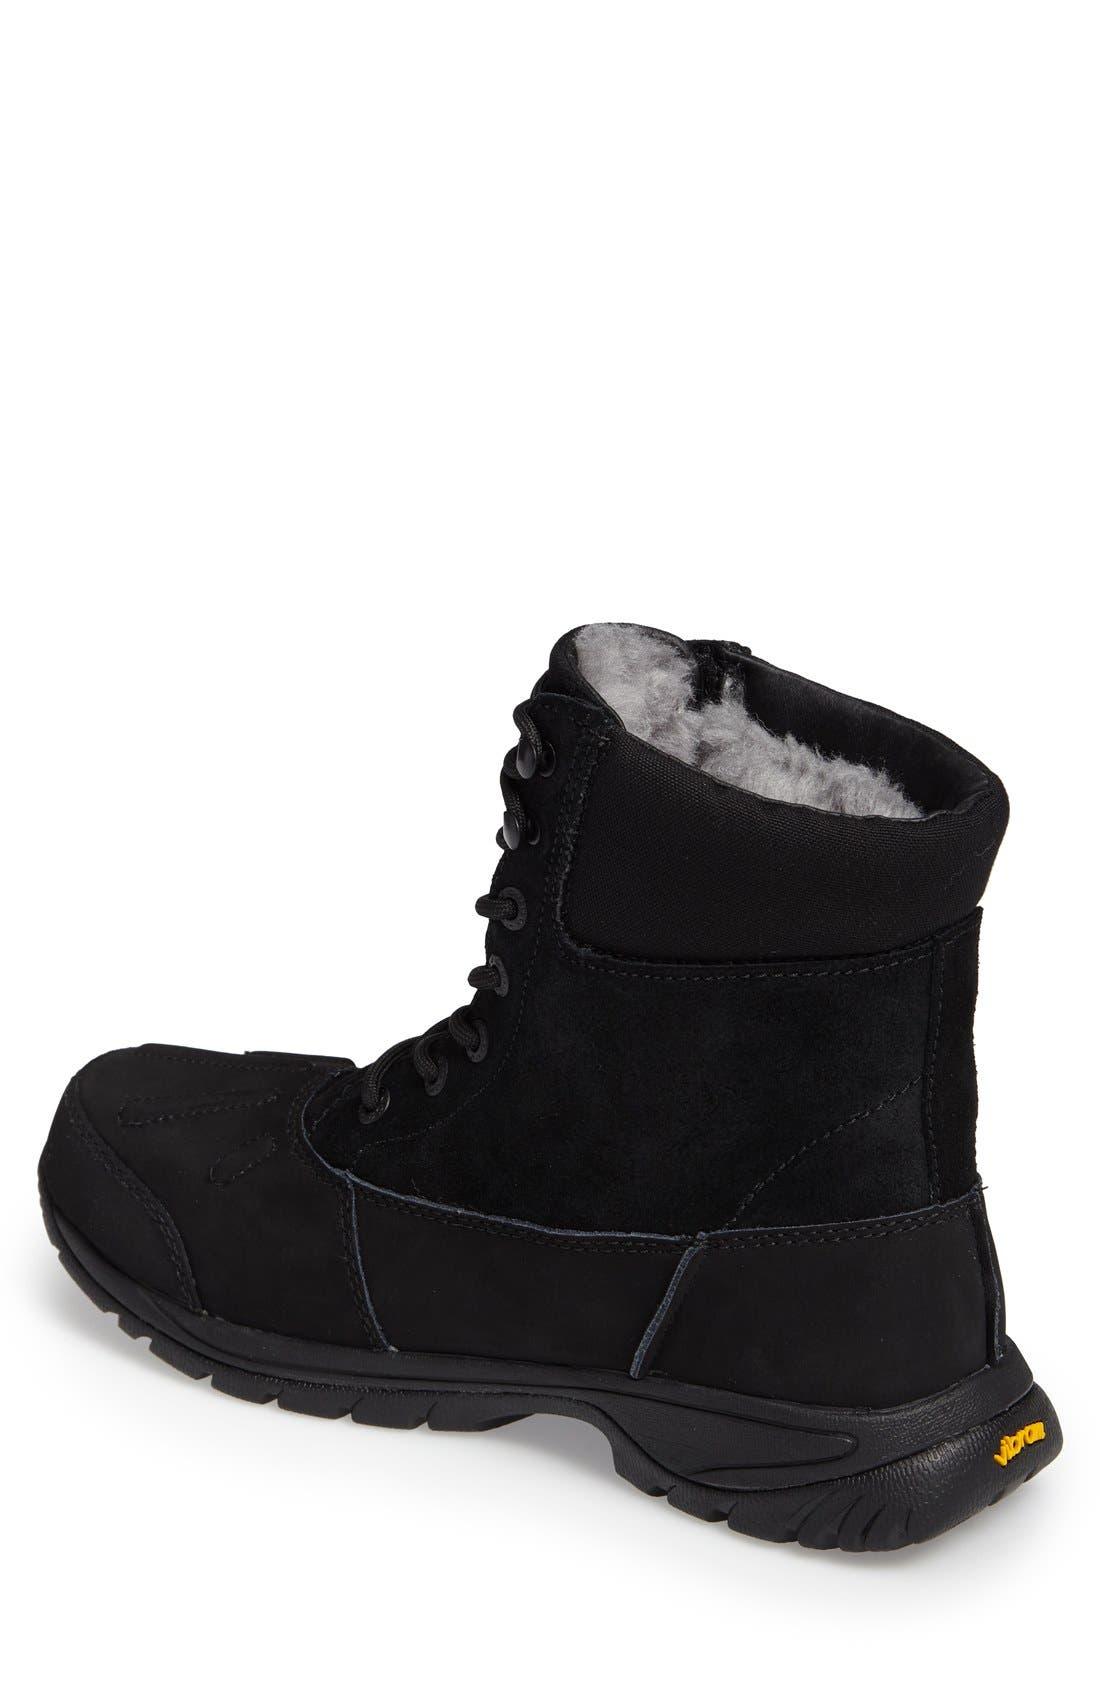 'Metcalf' Snow Boot,                             Alternate thumbnail 6, color,                             001